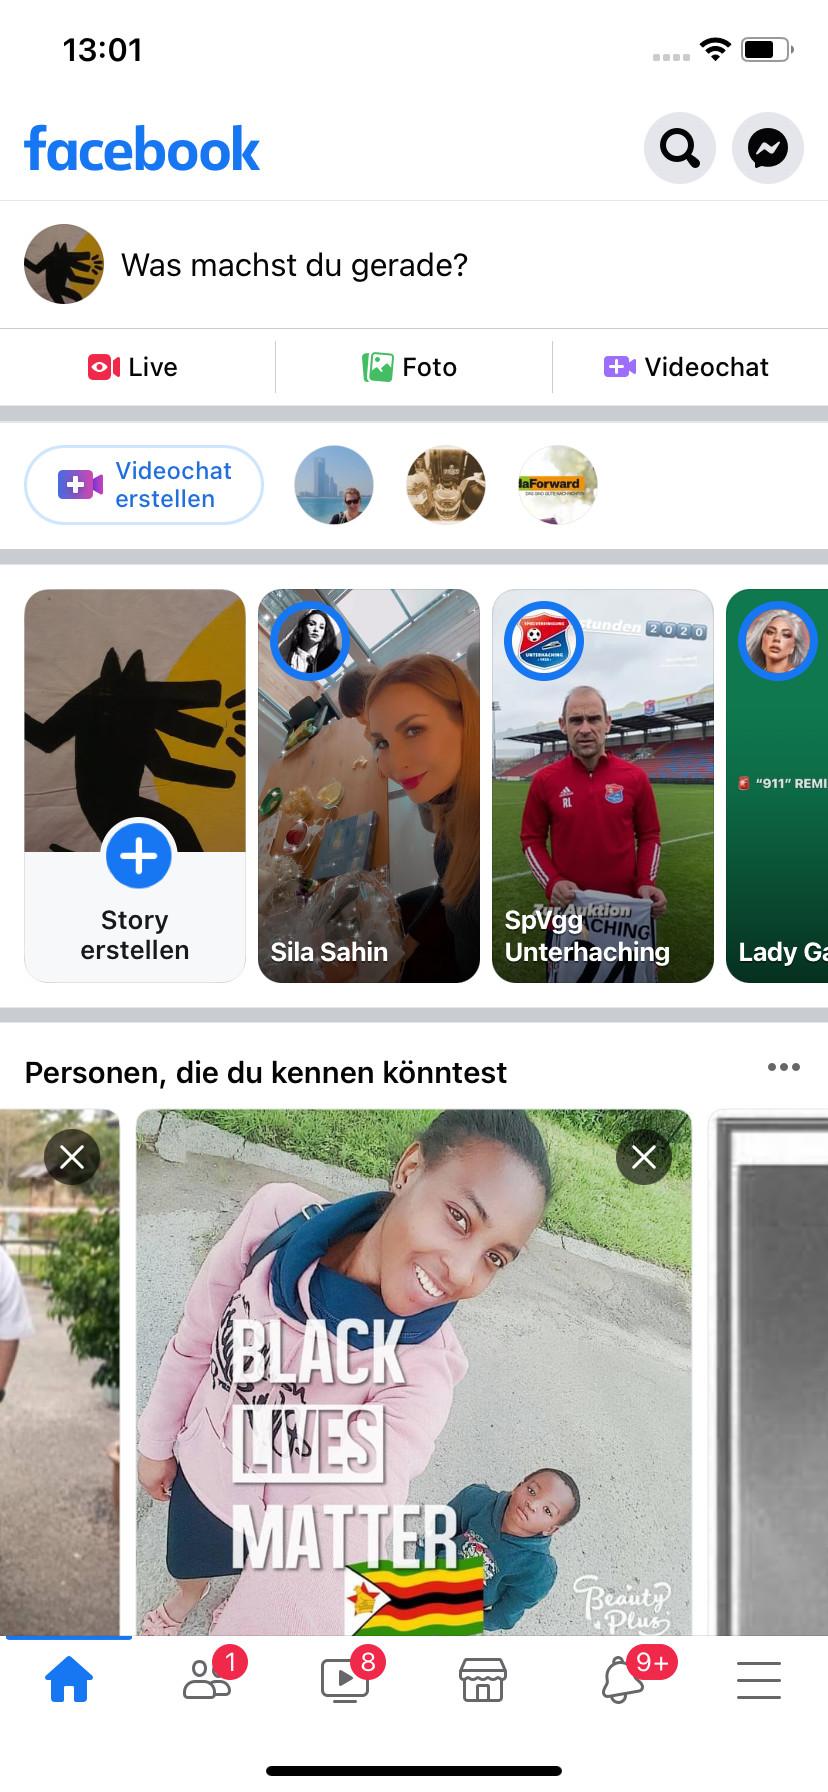 Screenshot 1 - Facebook (App für iPhone & iPad)